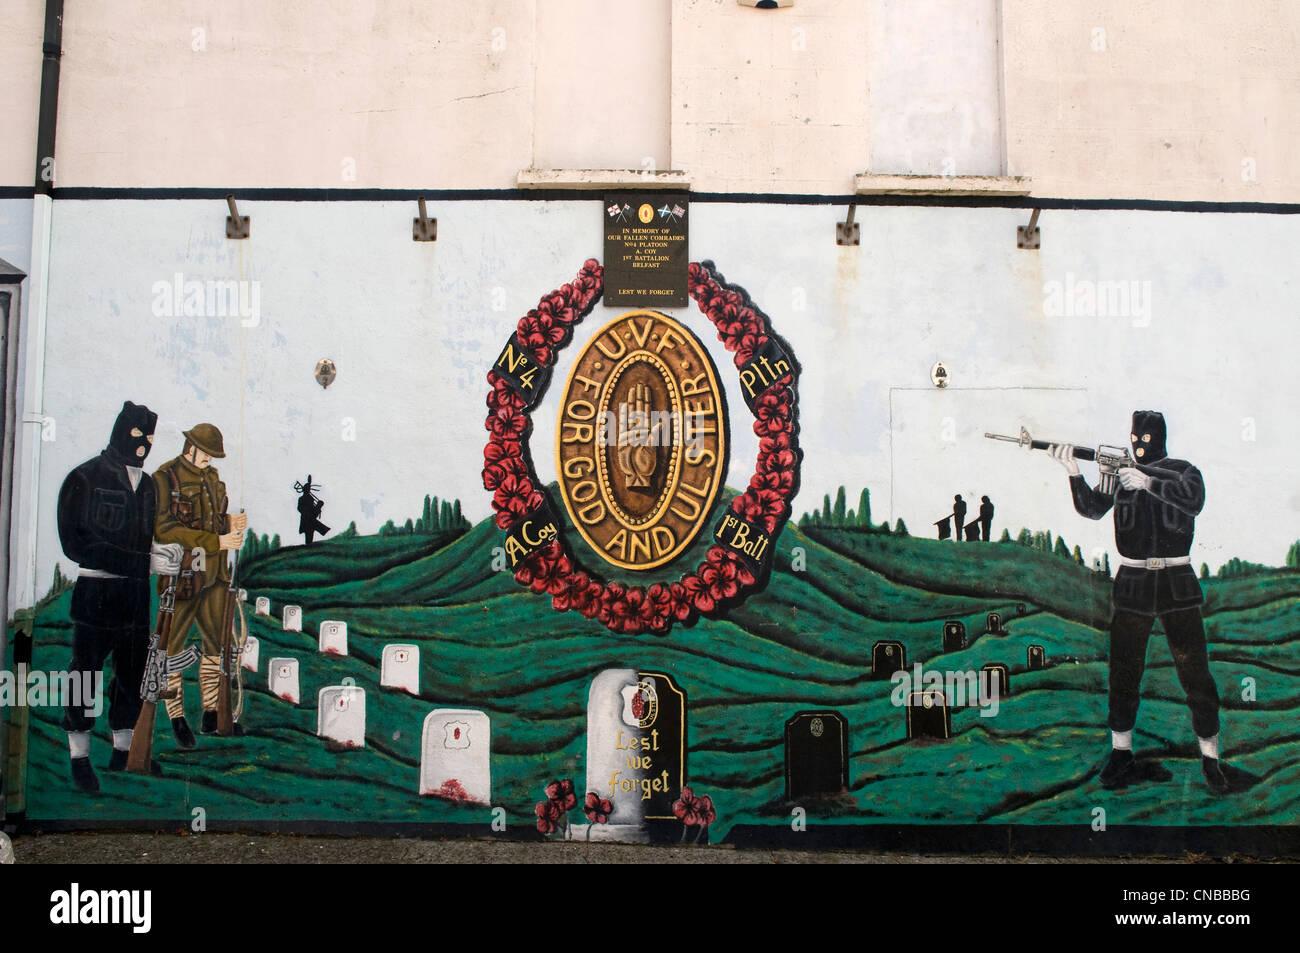 United Kingdom, Northern Ireland, Belfast, Protestant western district of Shankill, Shankill road, murals - Stock Image